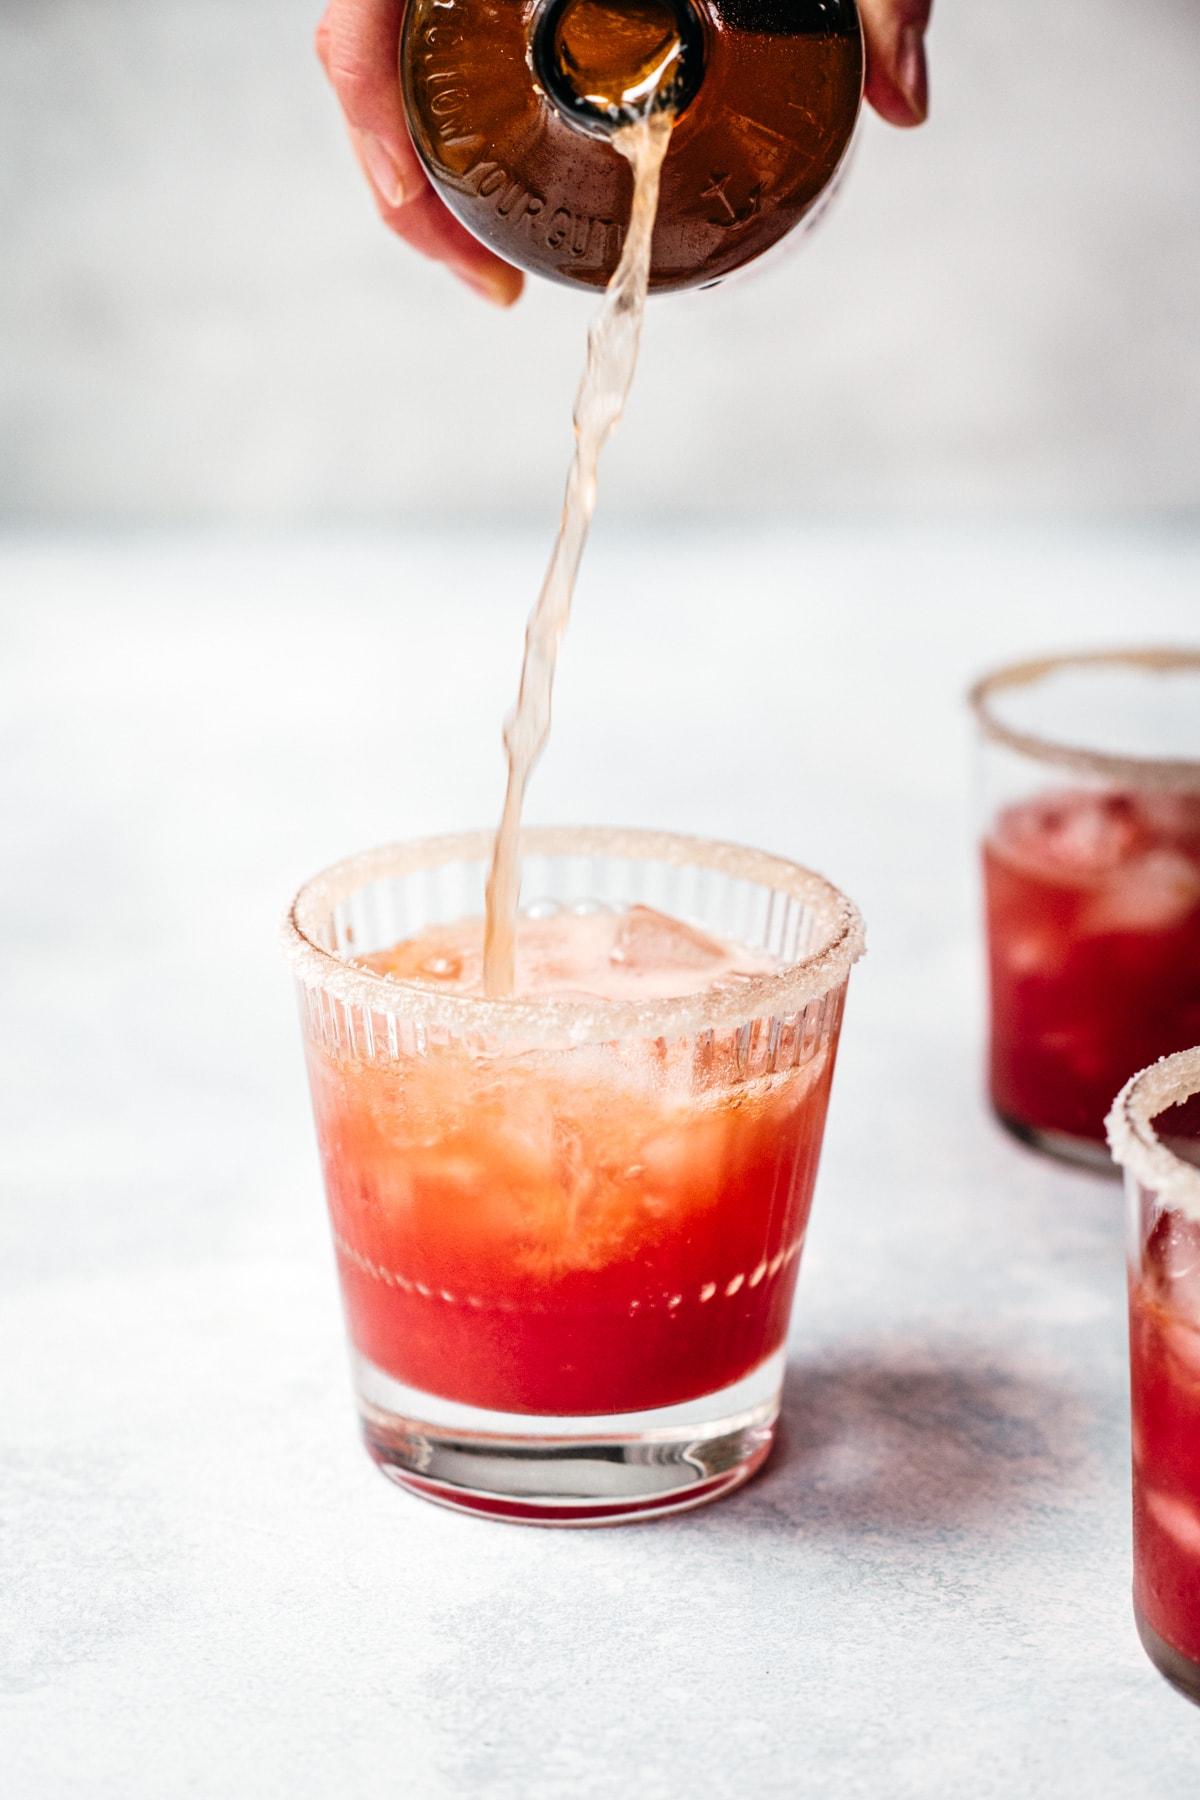 pouring kombucha into a blood orange margarita.